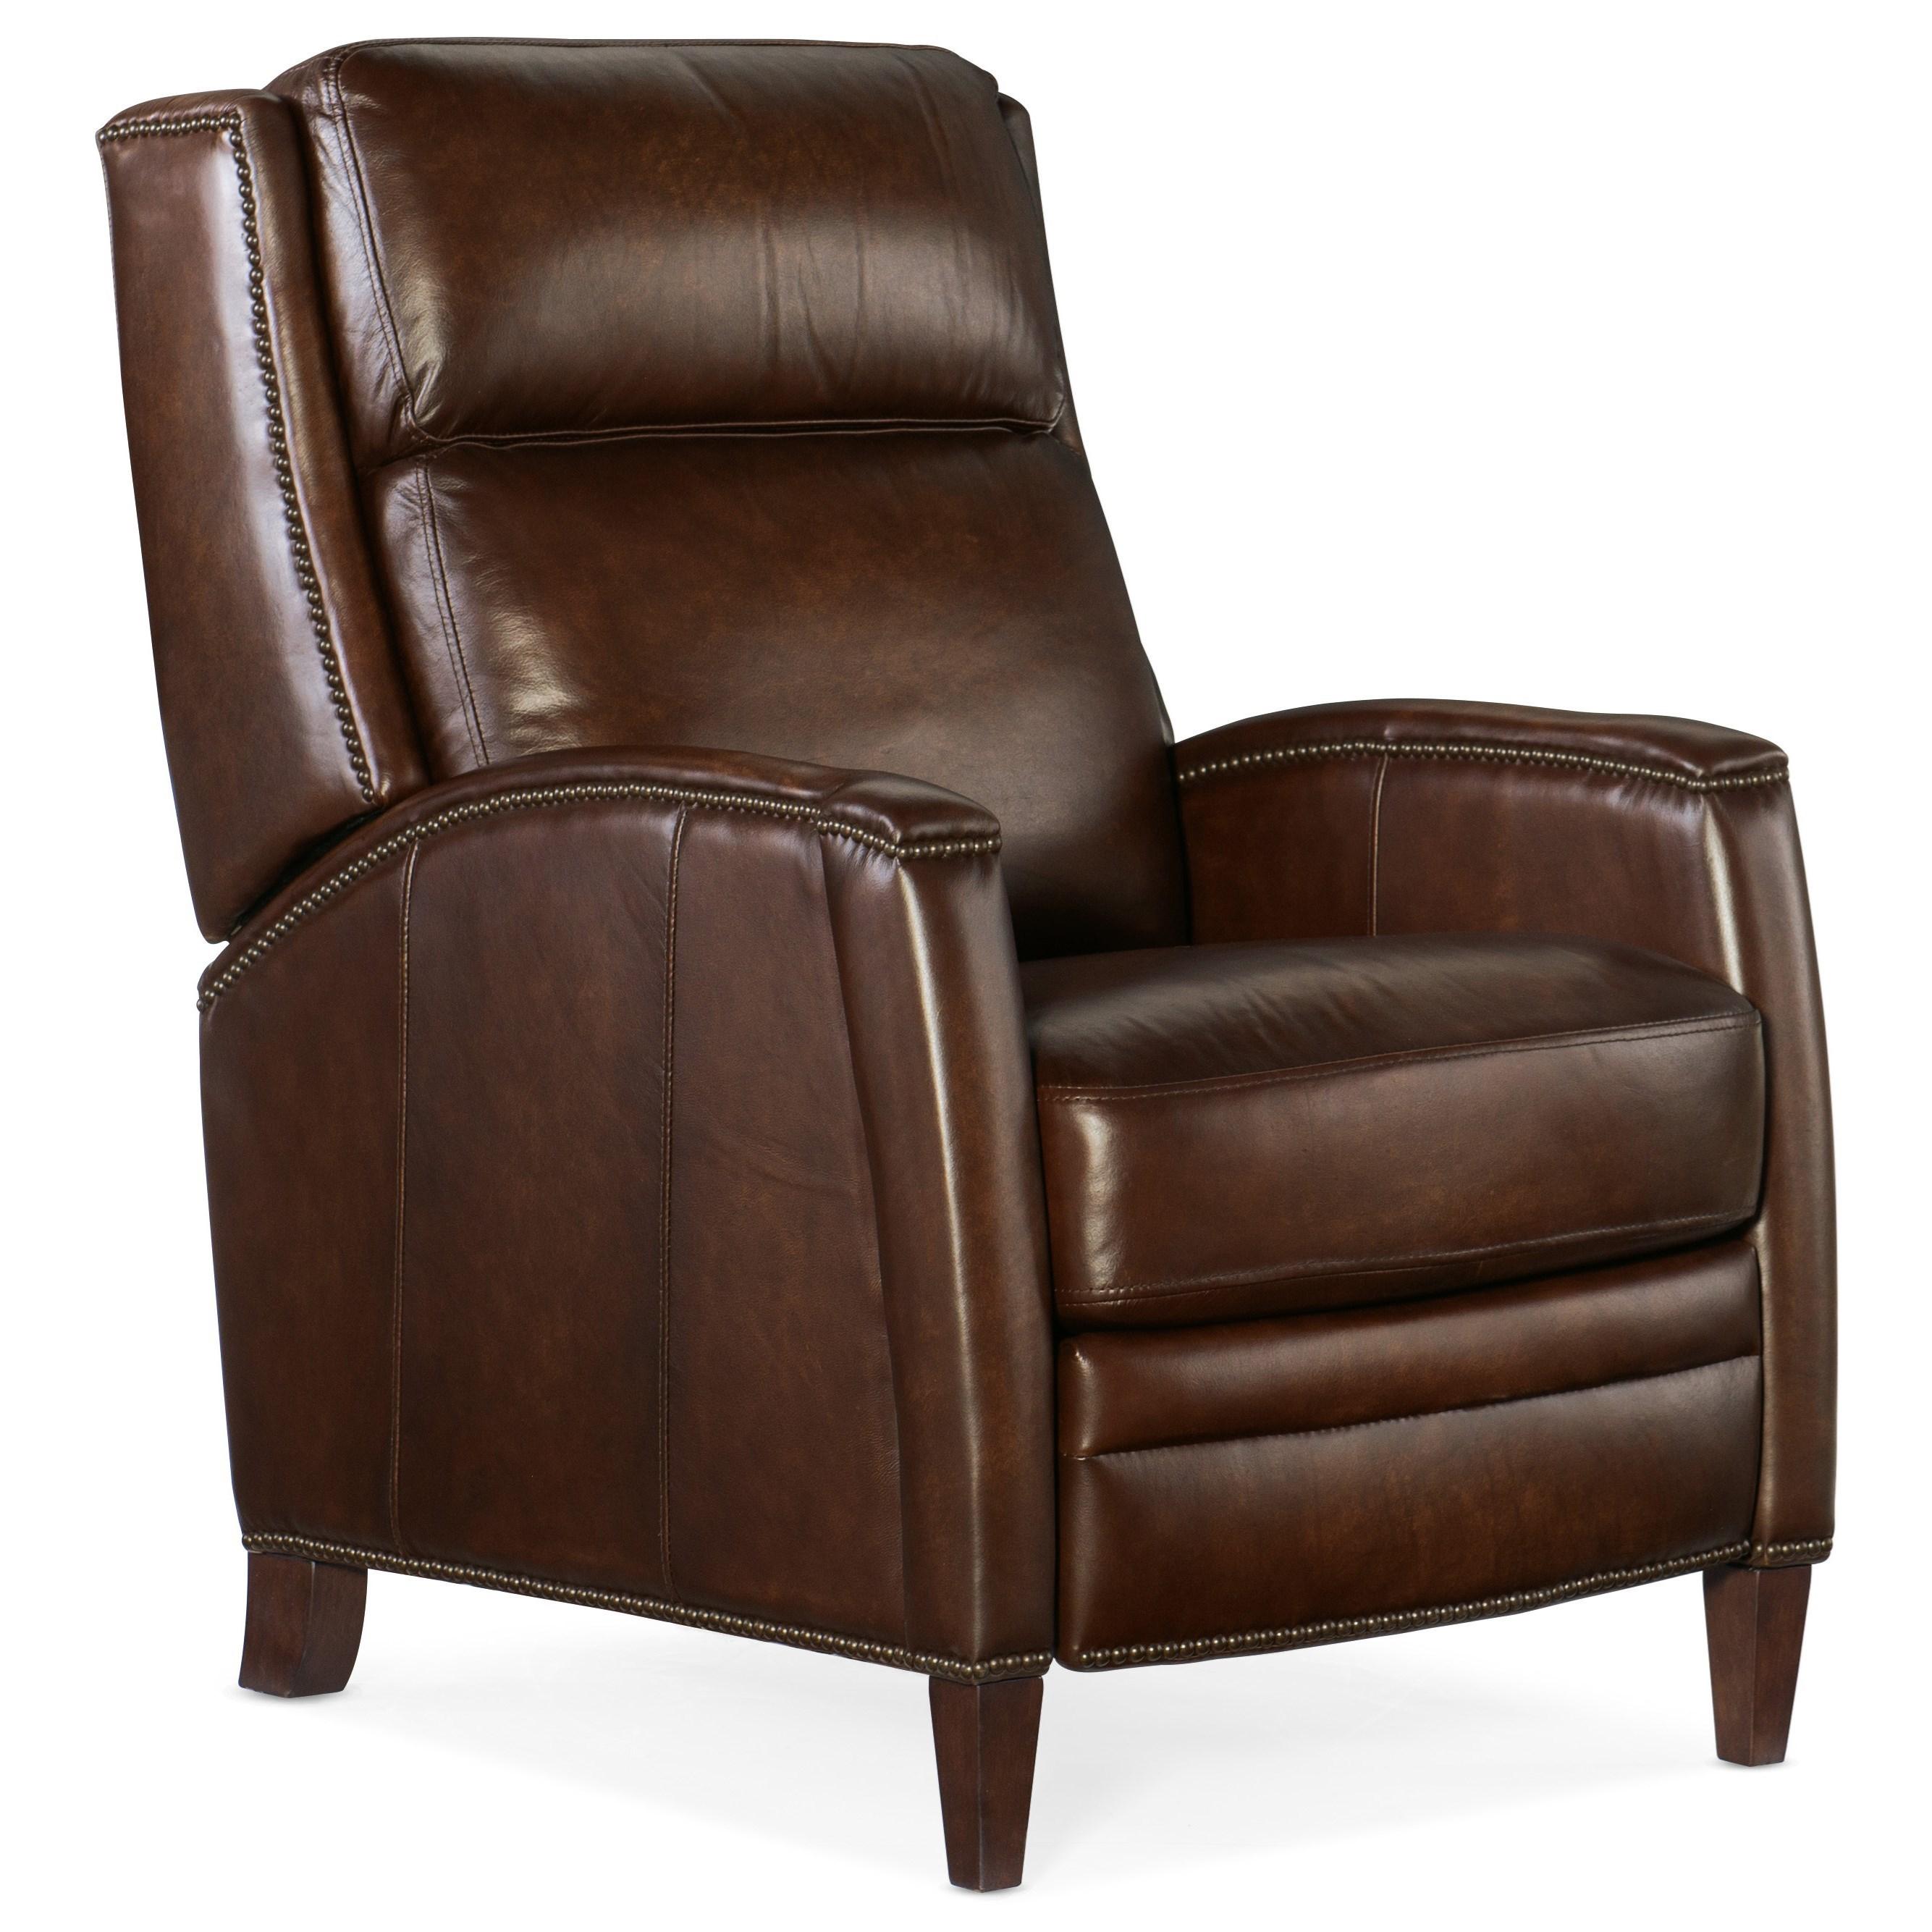 Declan Manual Push Back Recliner by Hooker Furniture at Mueller Furniture